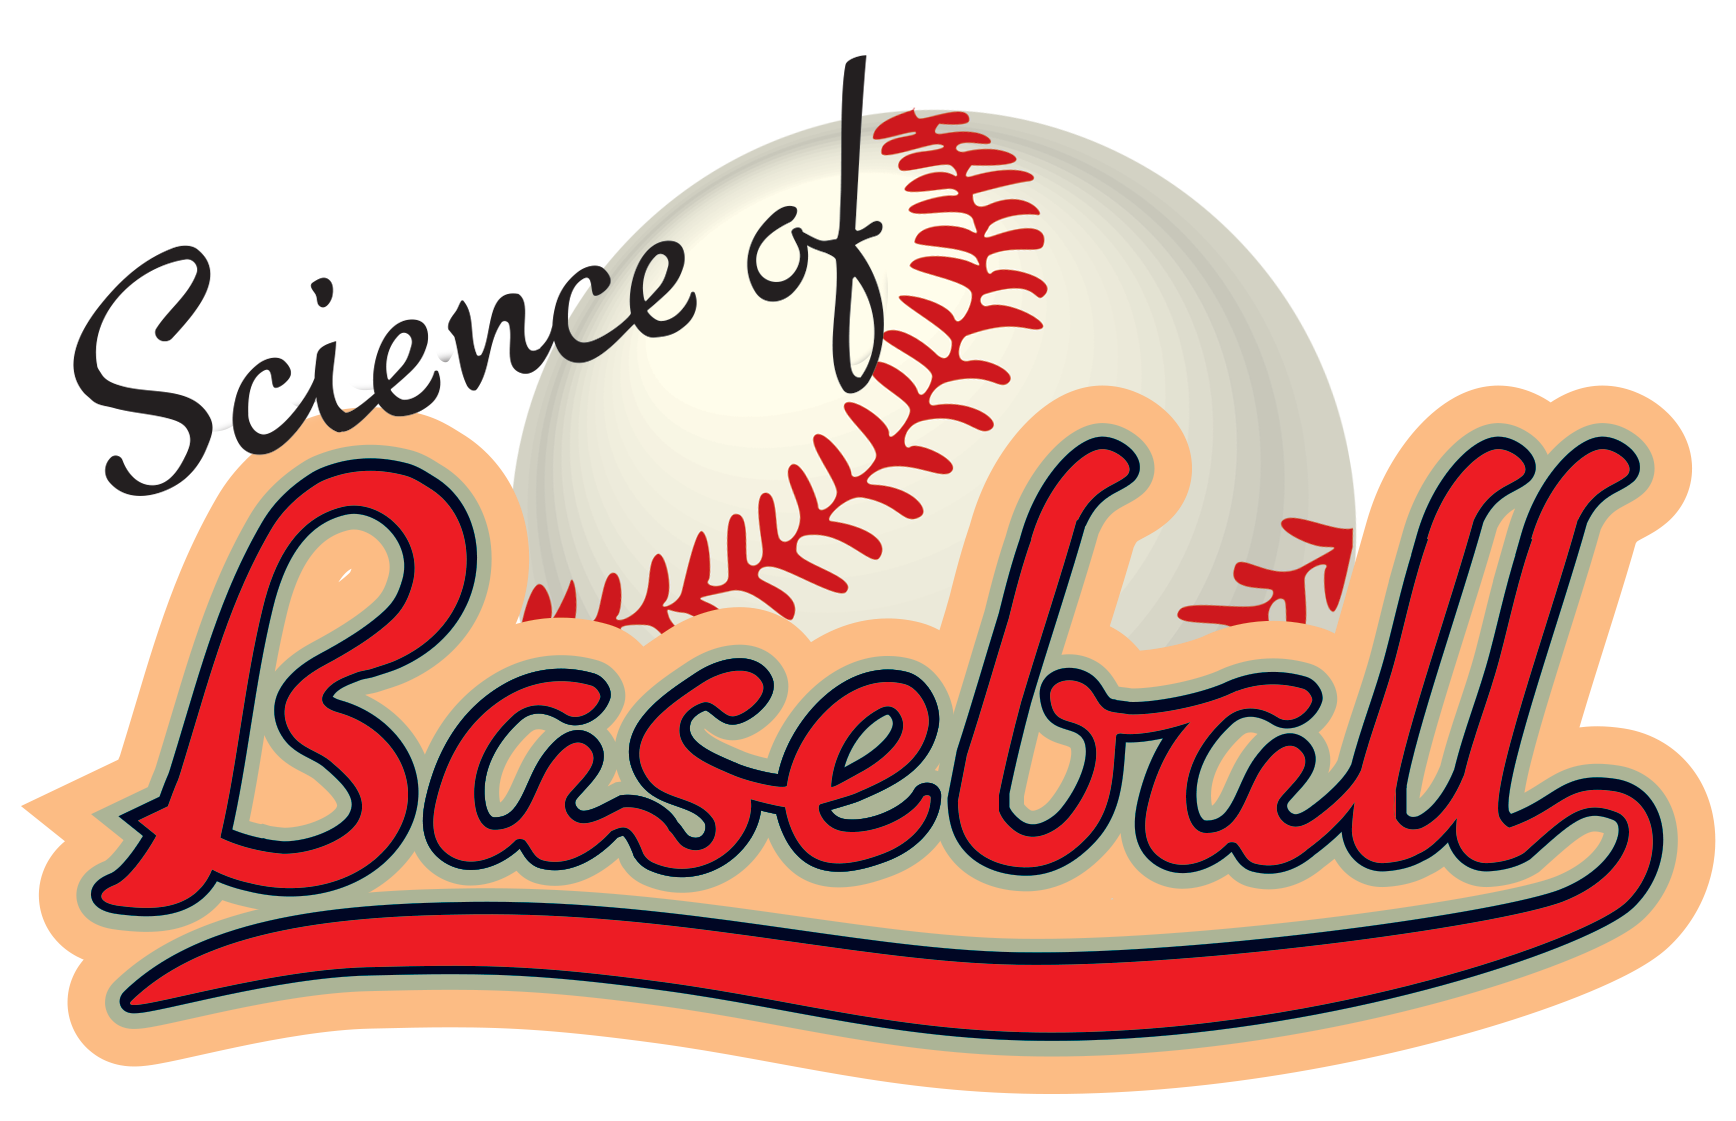 Science of Baseball.